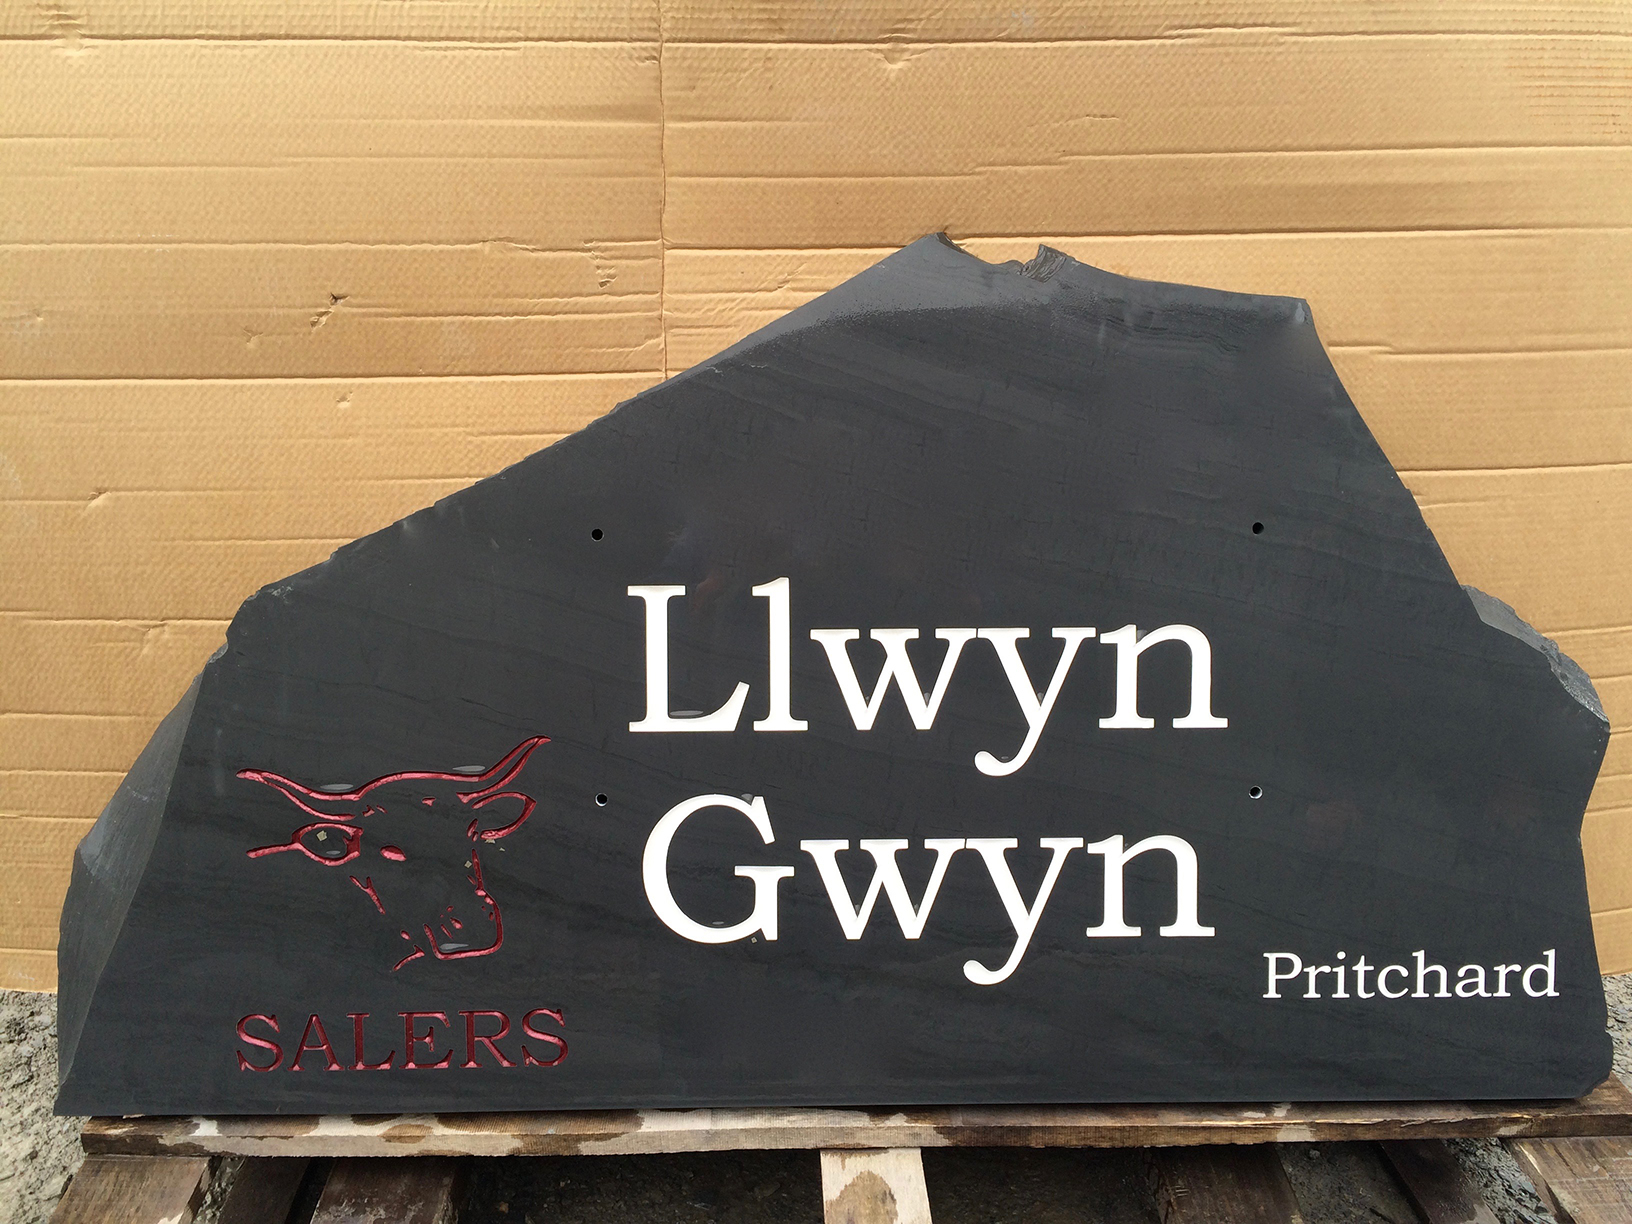 Bespoke Welsh slate farm sign